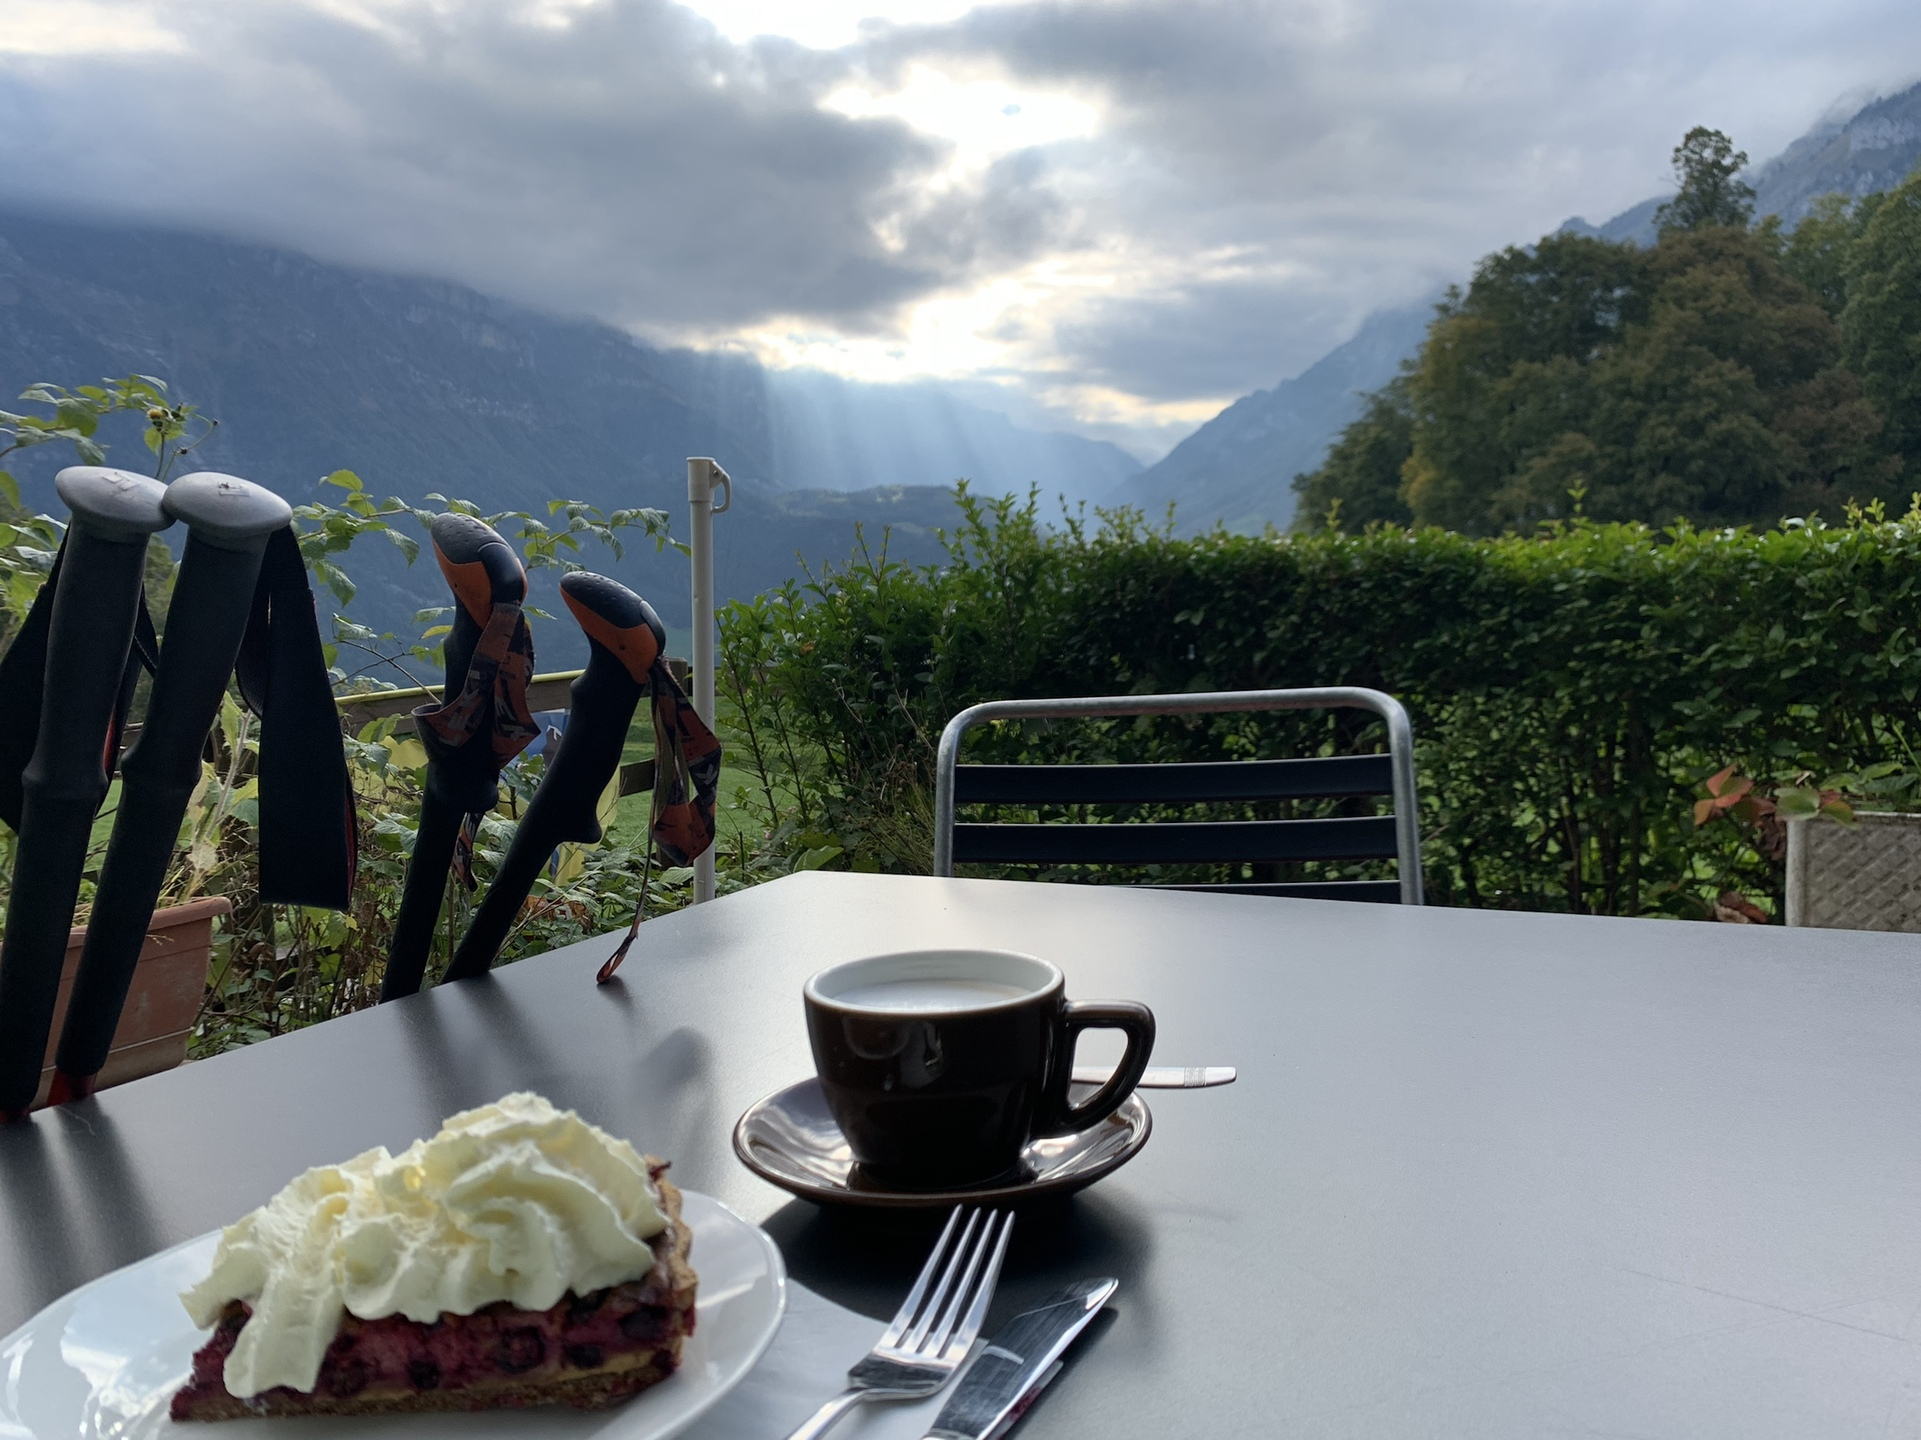 Alpenblick - Hiking Meditation Break